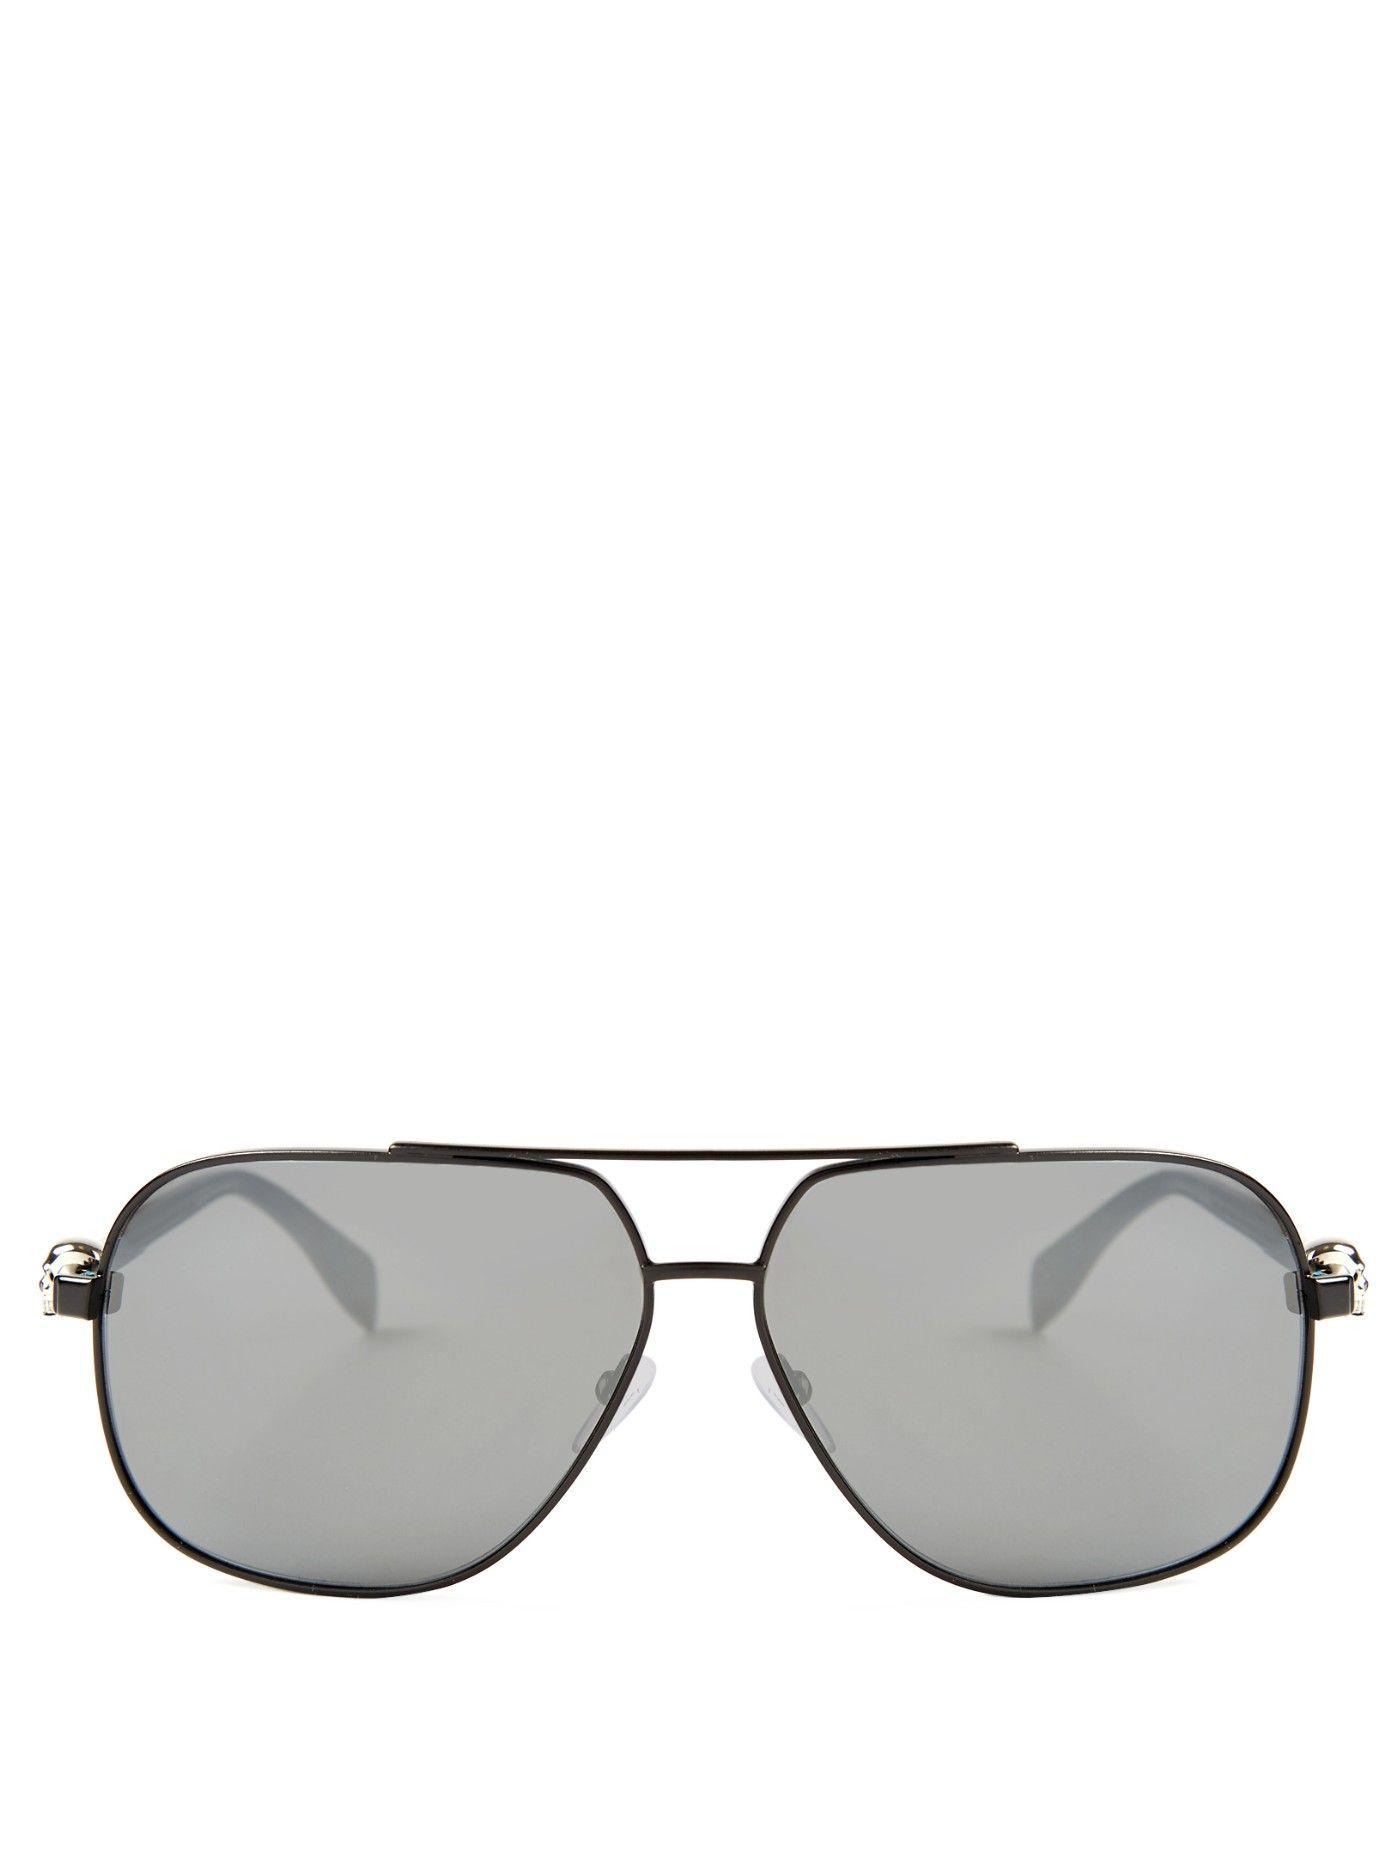 c3e169ae97 Skull-hinge aviator sunglasses